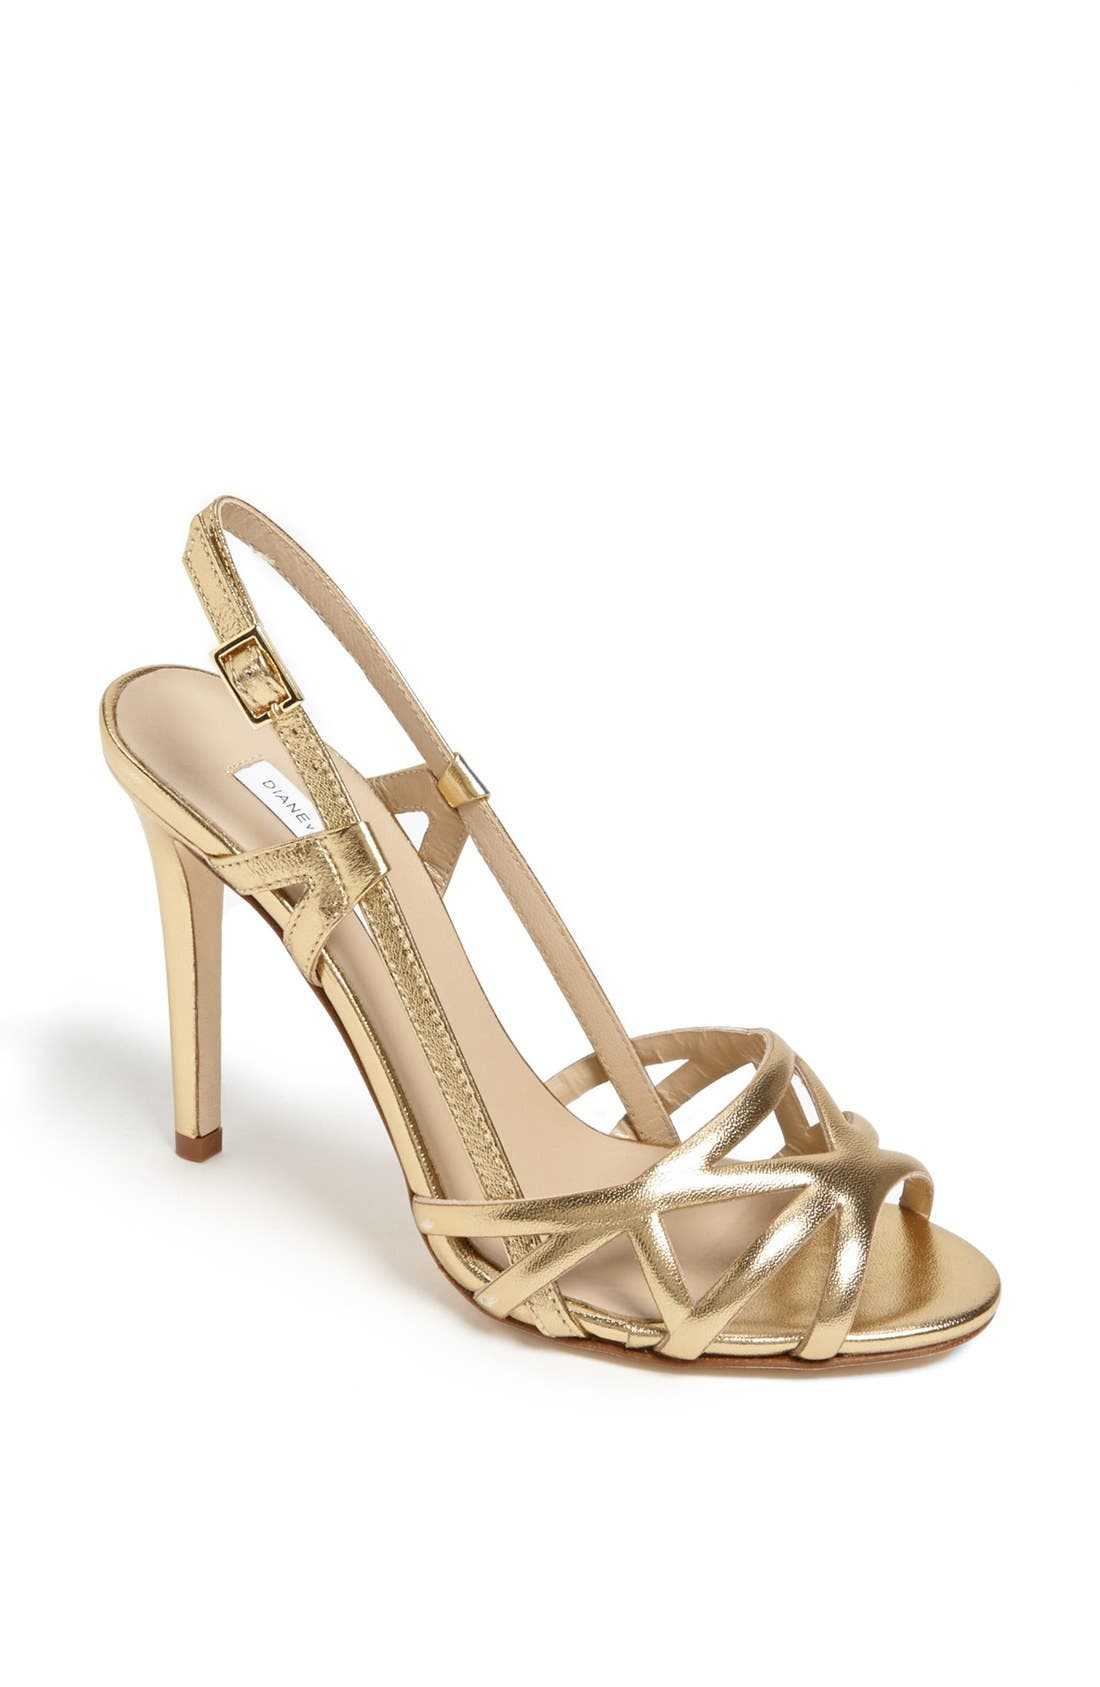 Alternate Image 1 Selected - Diane von Furstenberg 'Upton' Metallic Leather Sandal